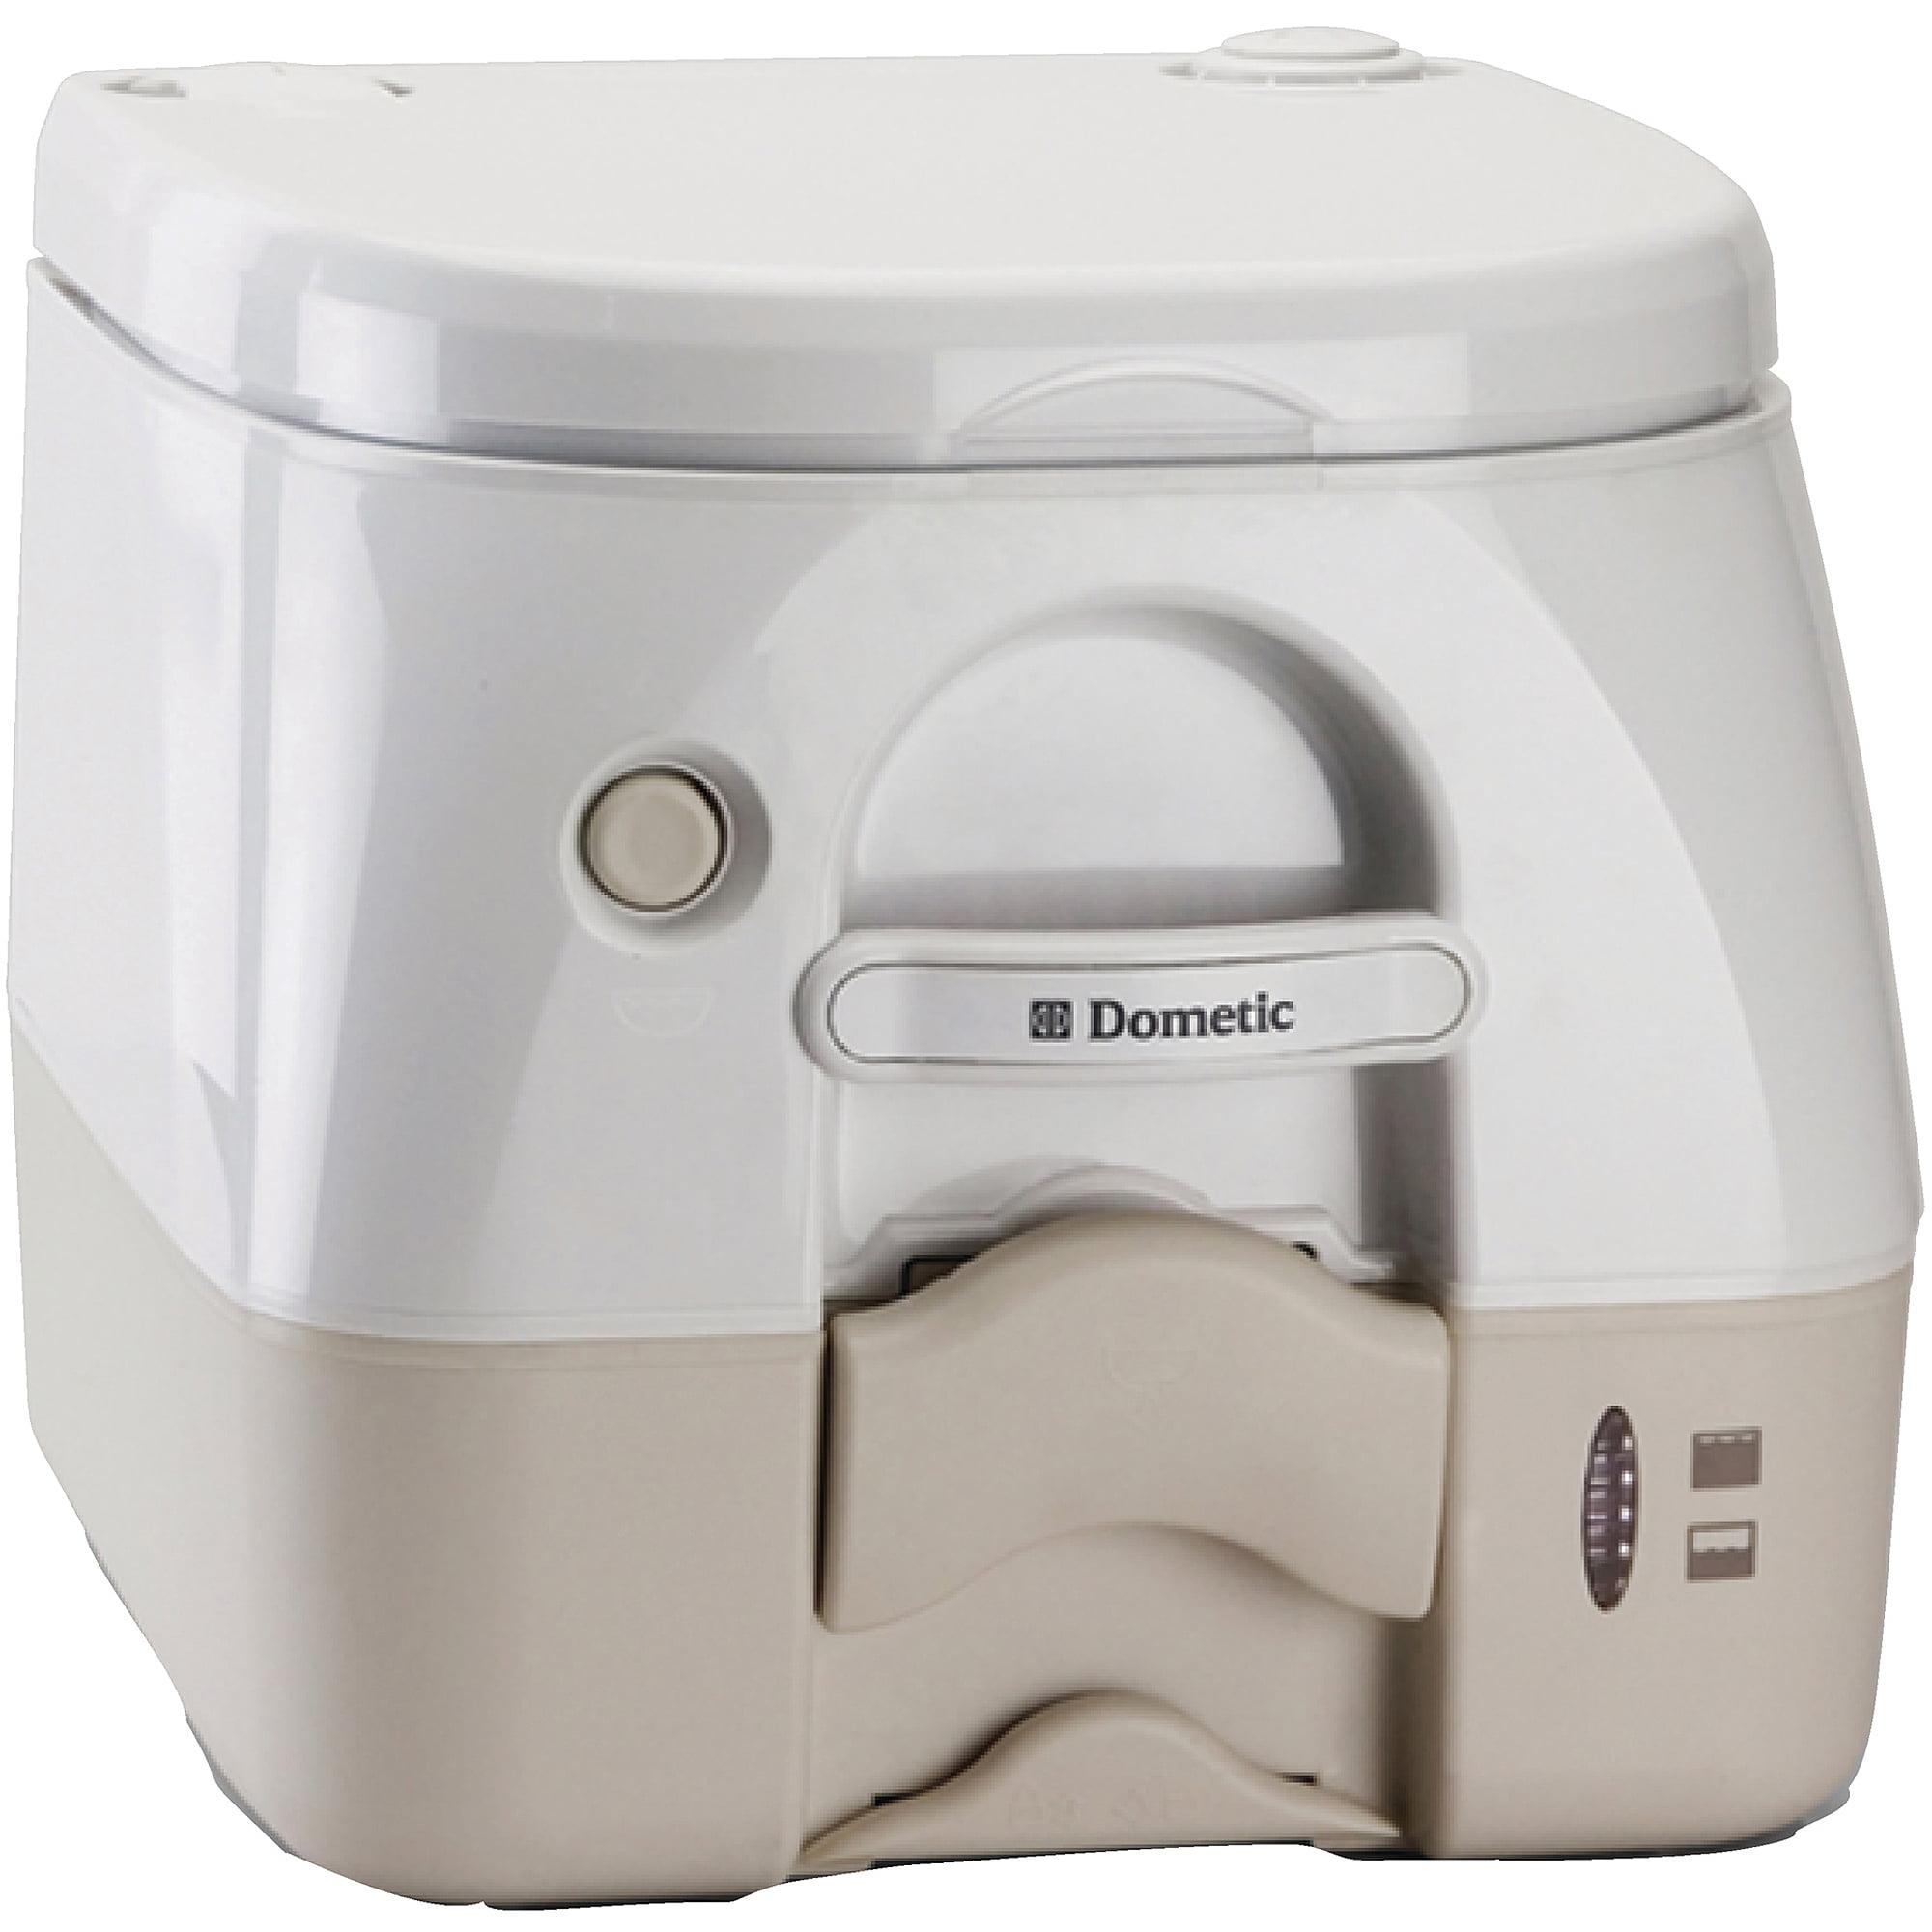 SeaLand 2.5 Gallon Full Size SaniPottie 974MSD Portable Toilet with Push Button Flush, Tan by Dometic Corporation